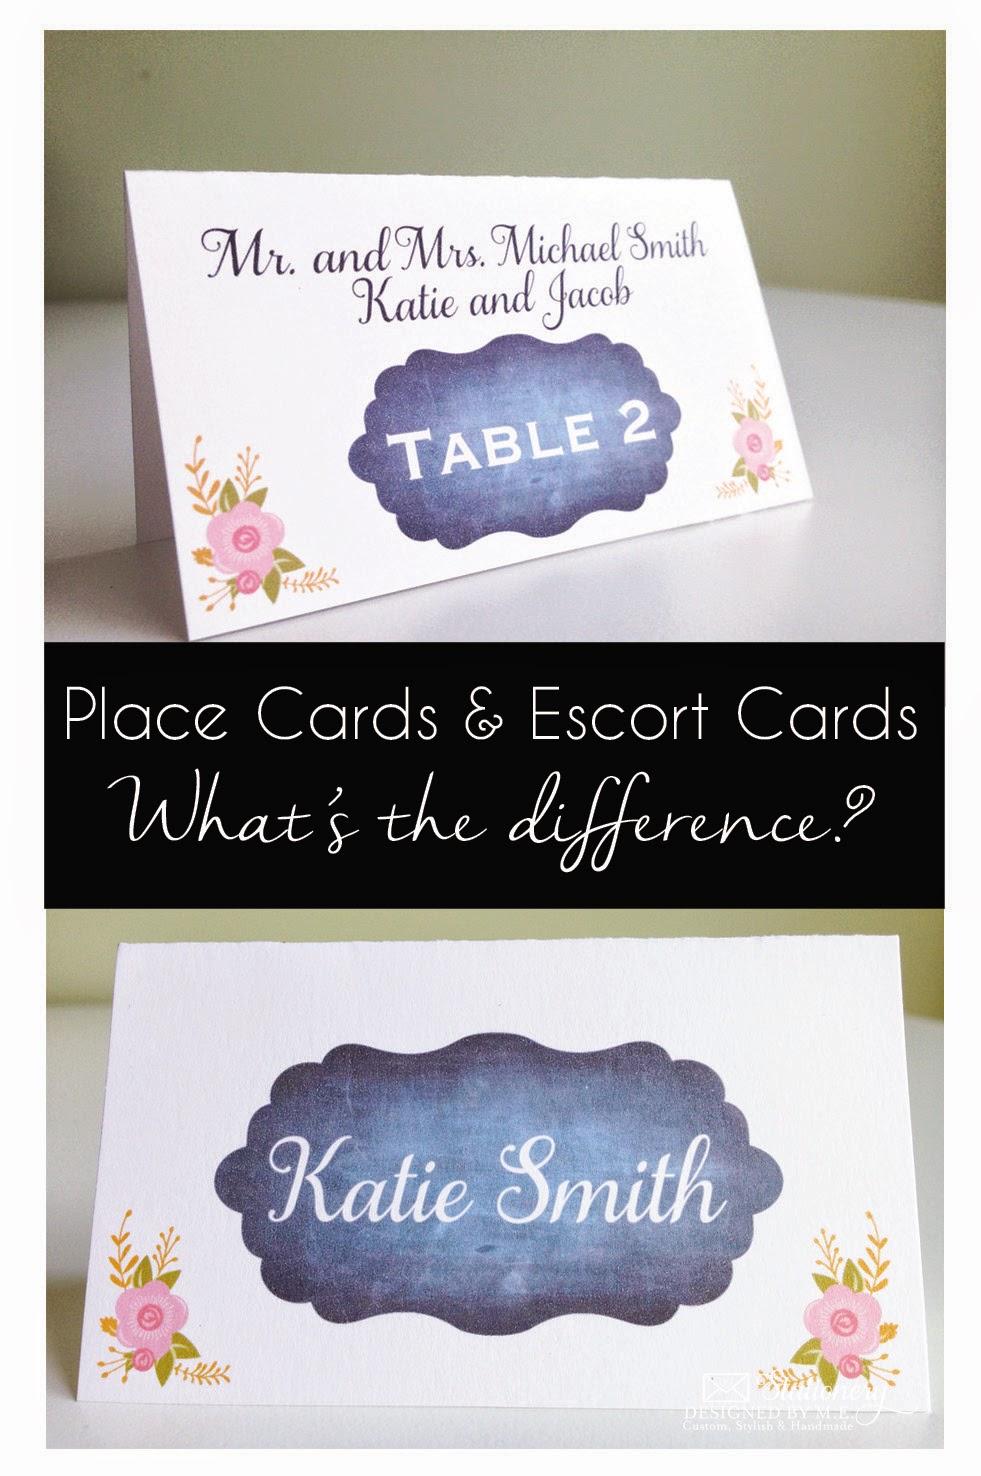 https://www.etsy.com/listing/188731692/custom-tented-place-cards-custom-escort?ref=shop_home_active_3